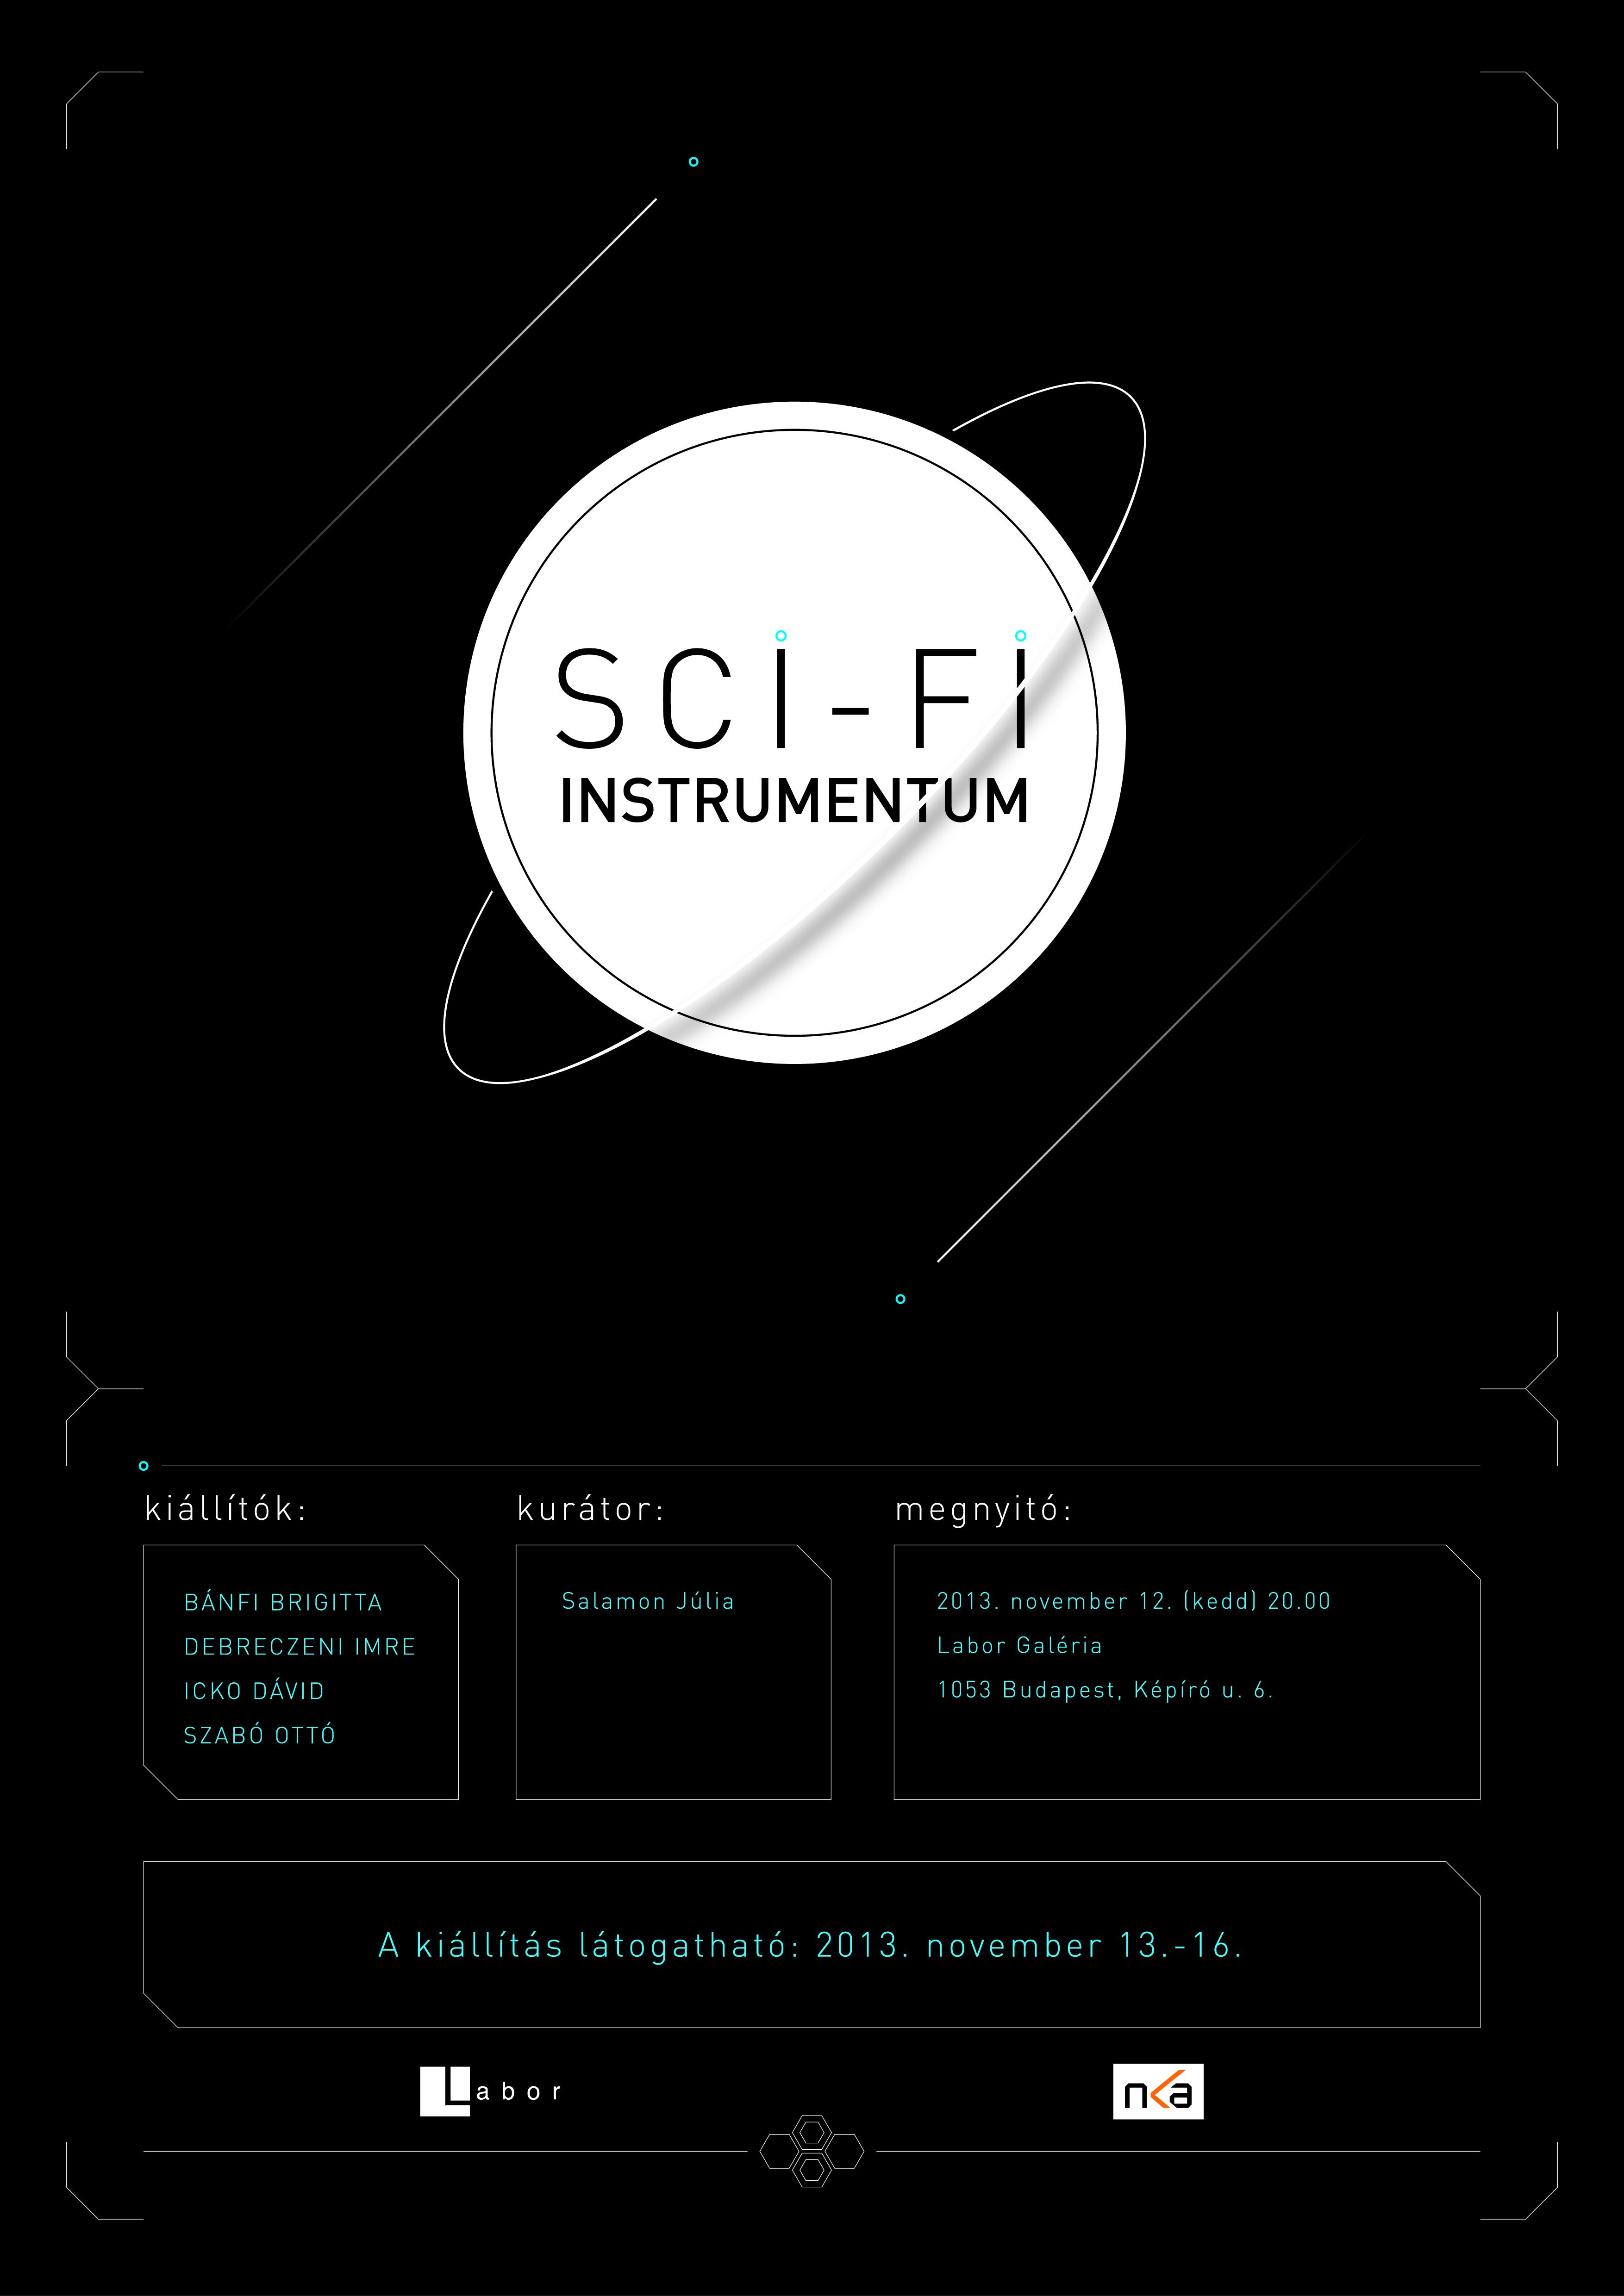 Sci-fi instrumentum